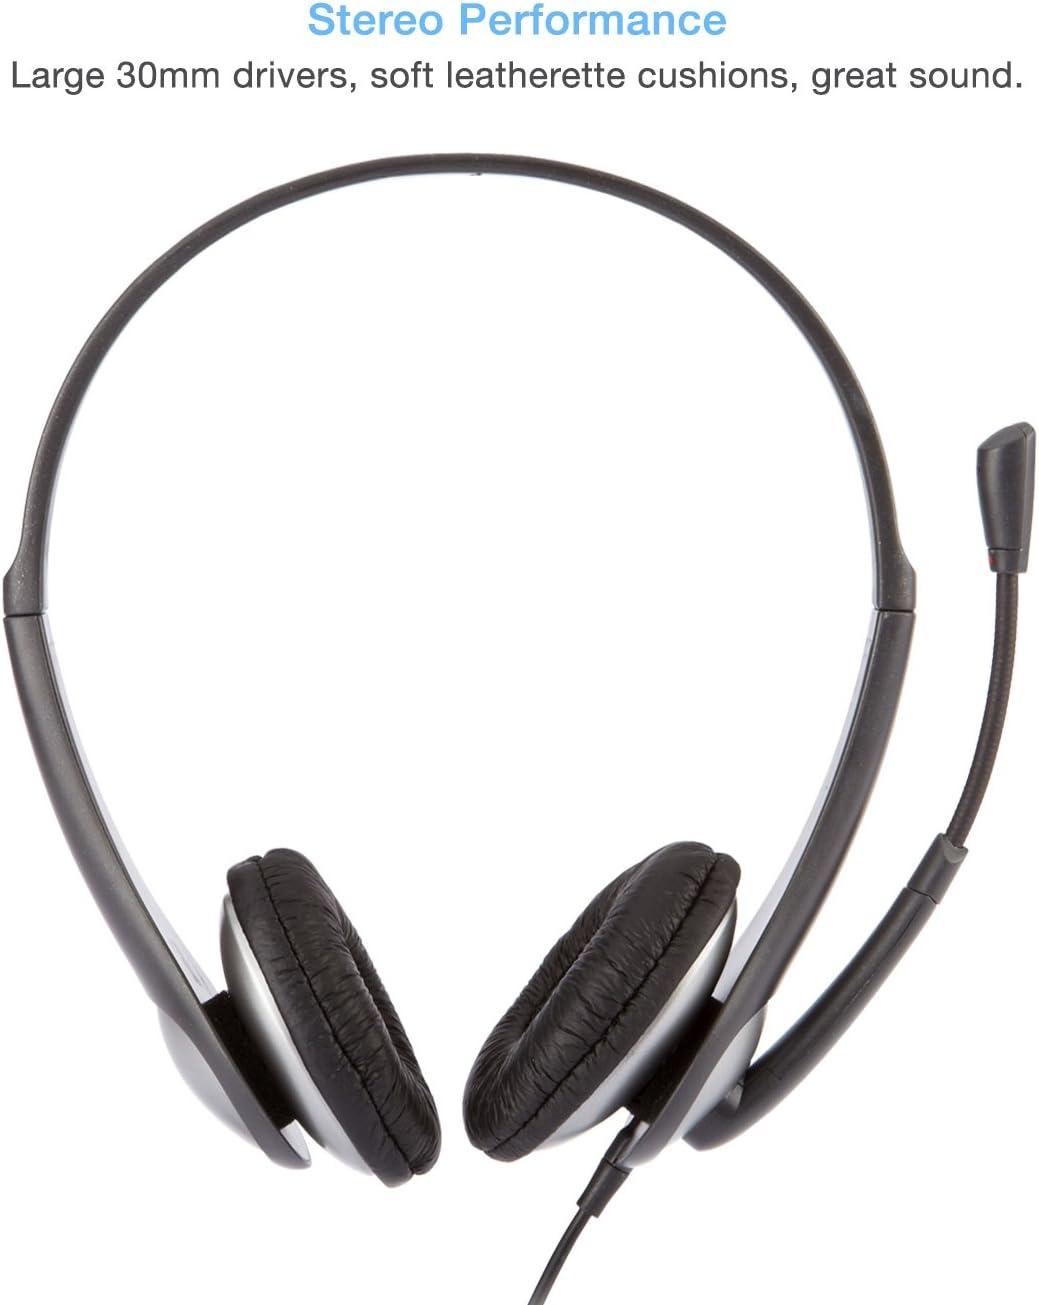 Headphone Splitter Semoic Headphone Adapter 3.5mm Stereo Male to 2 x 3.5mm Female Head